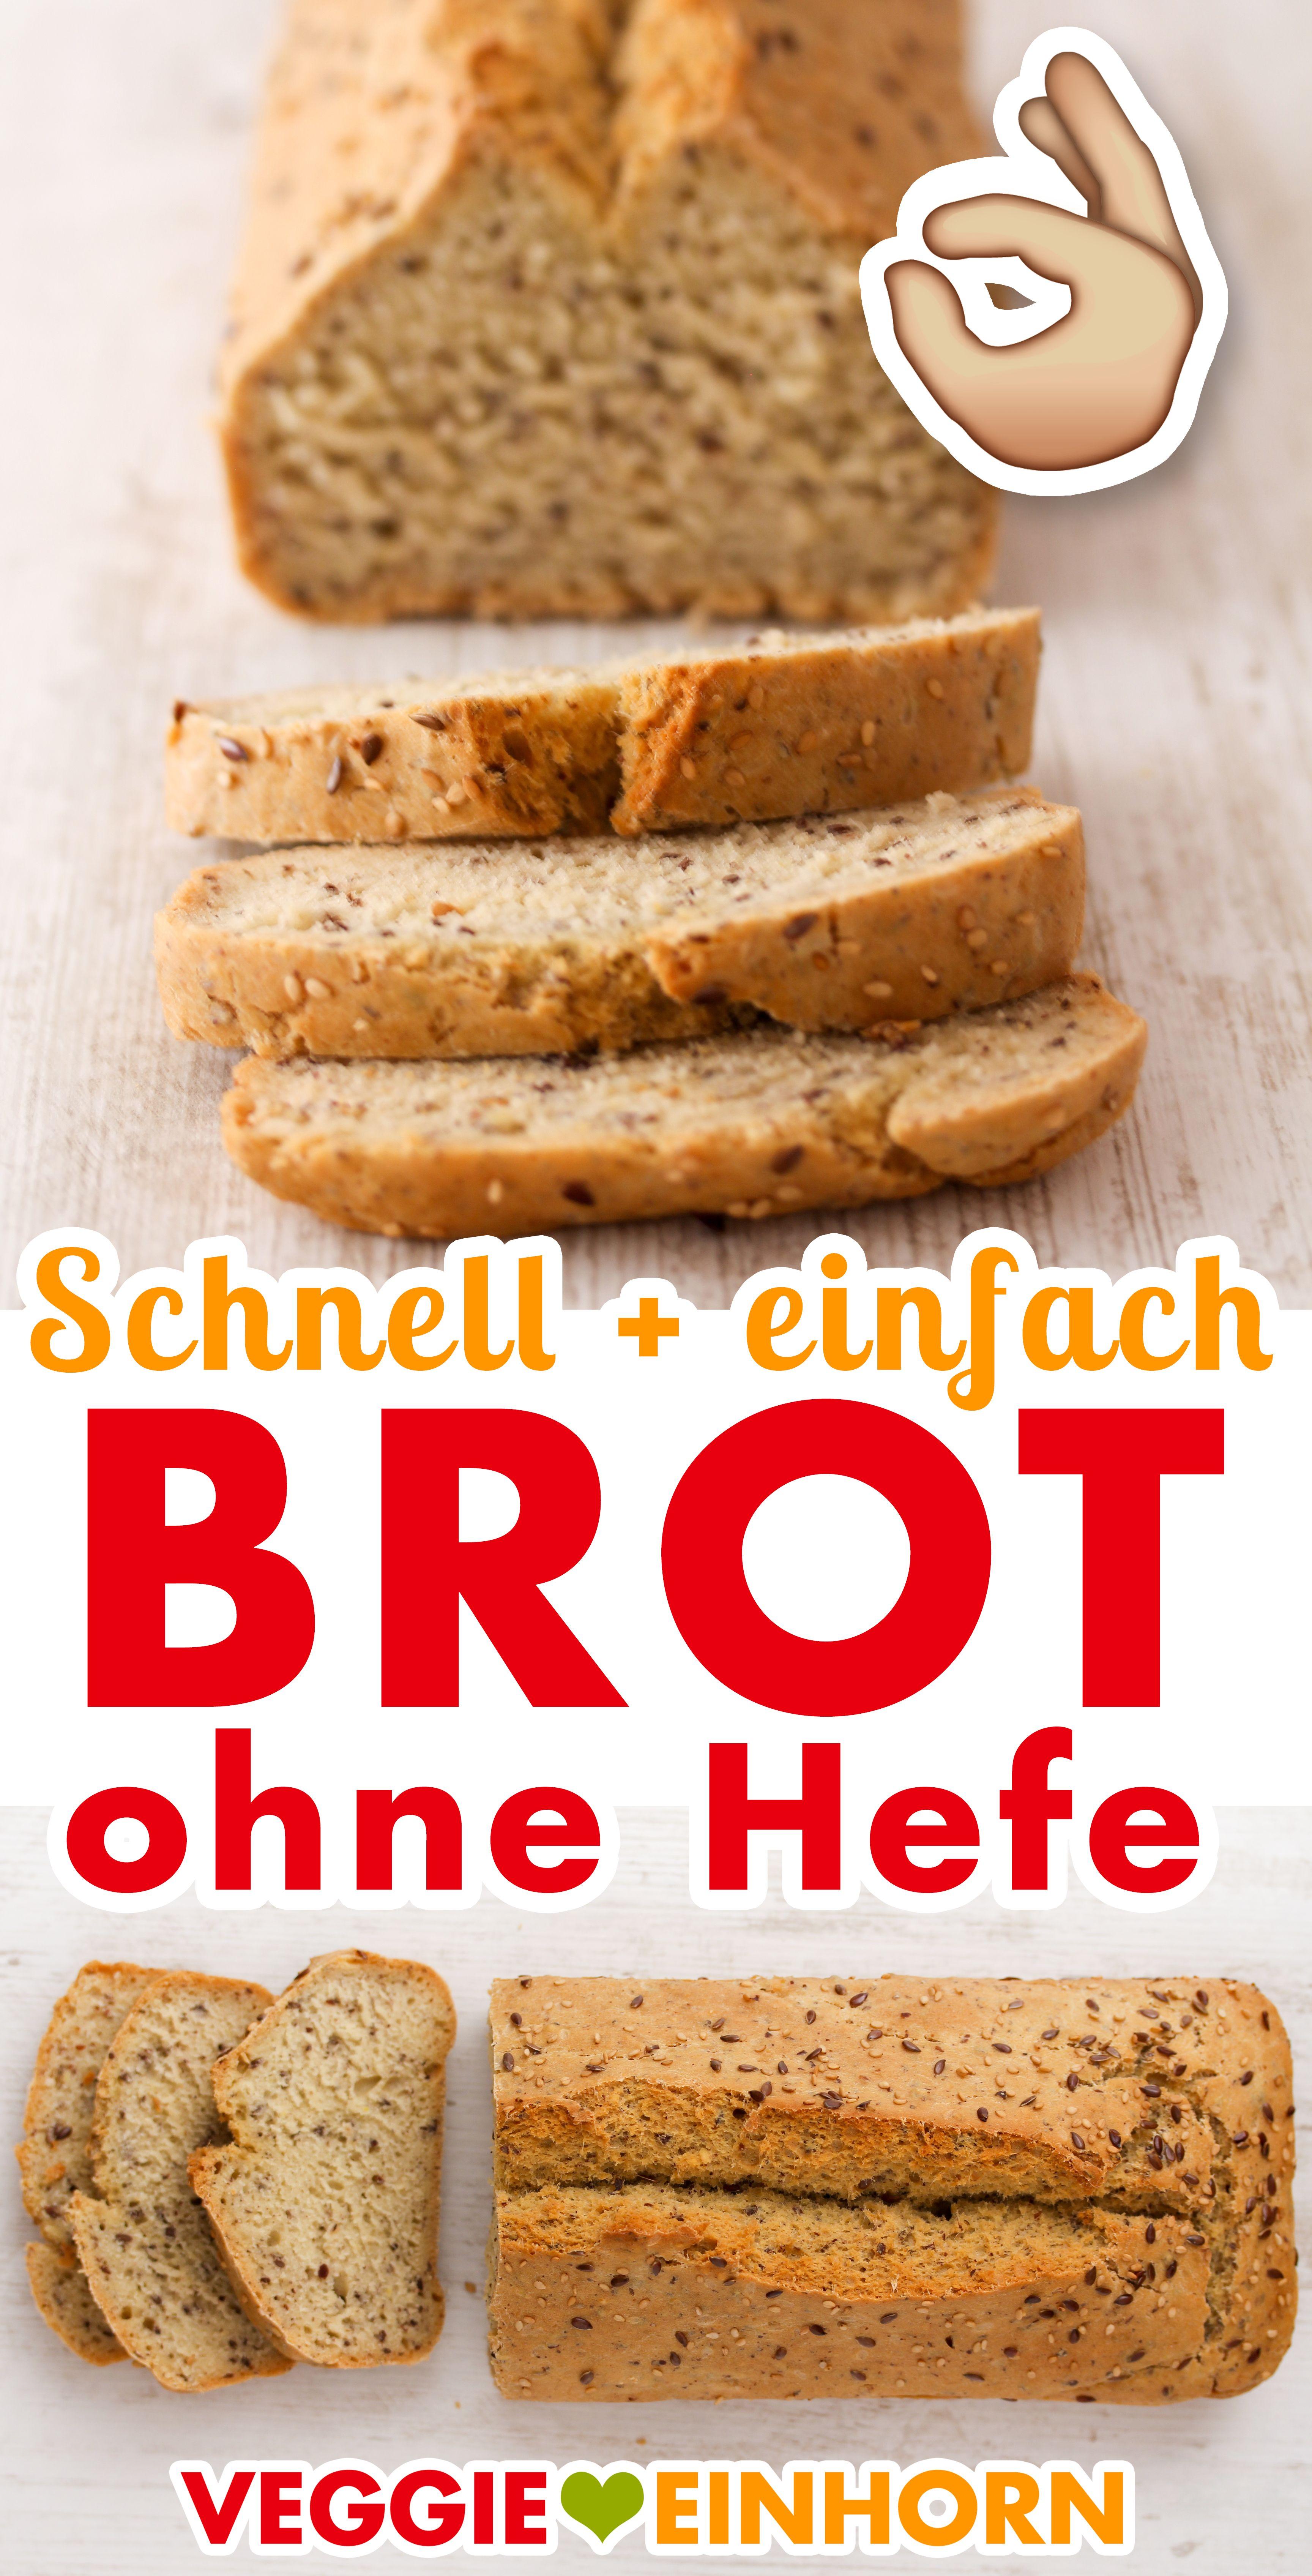 746c34f09ee97d92d1683b28dc931fbe - Brot Rezepte Ohne Hefe